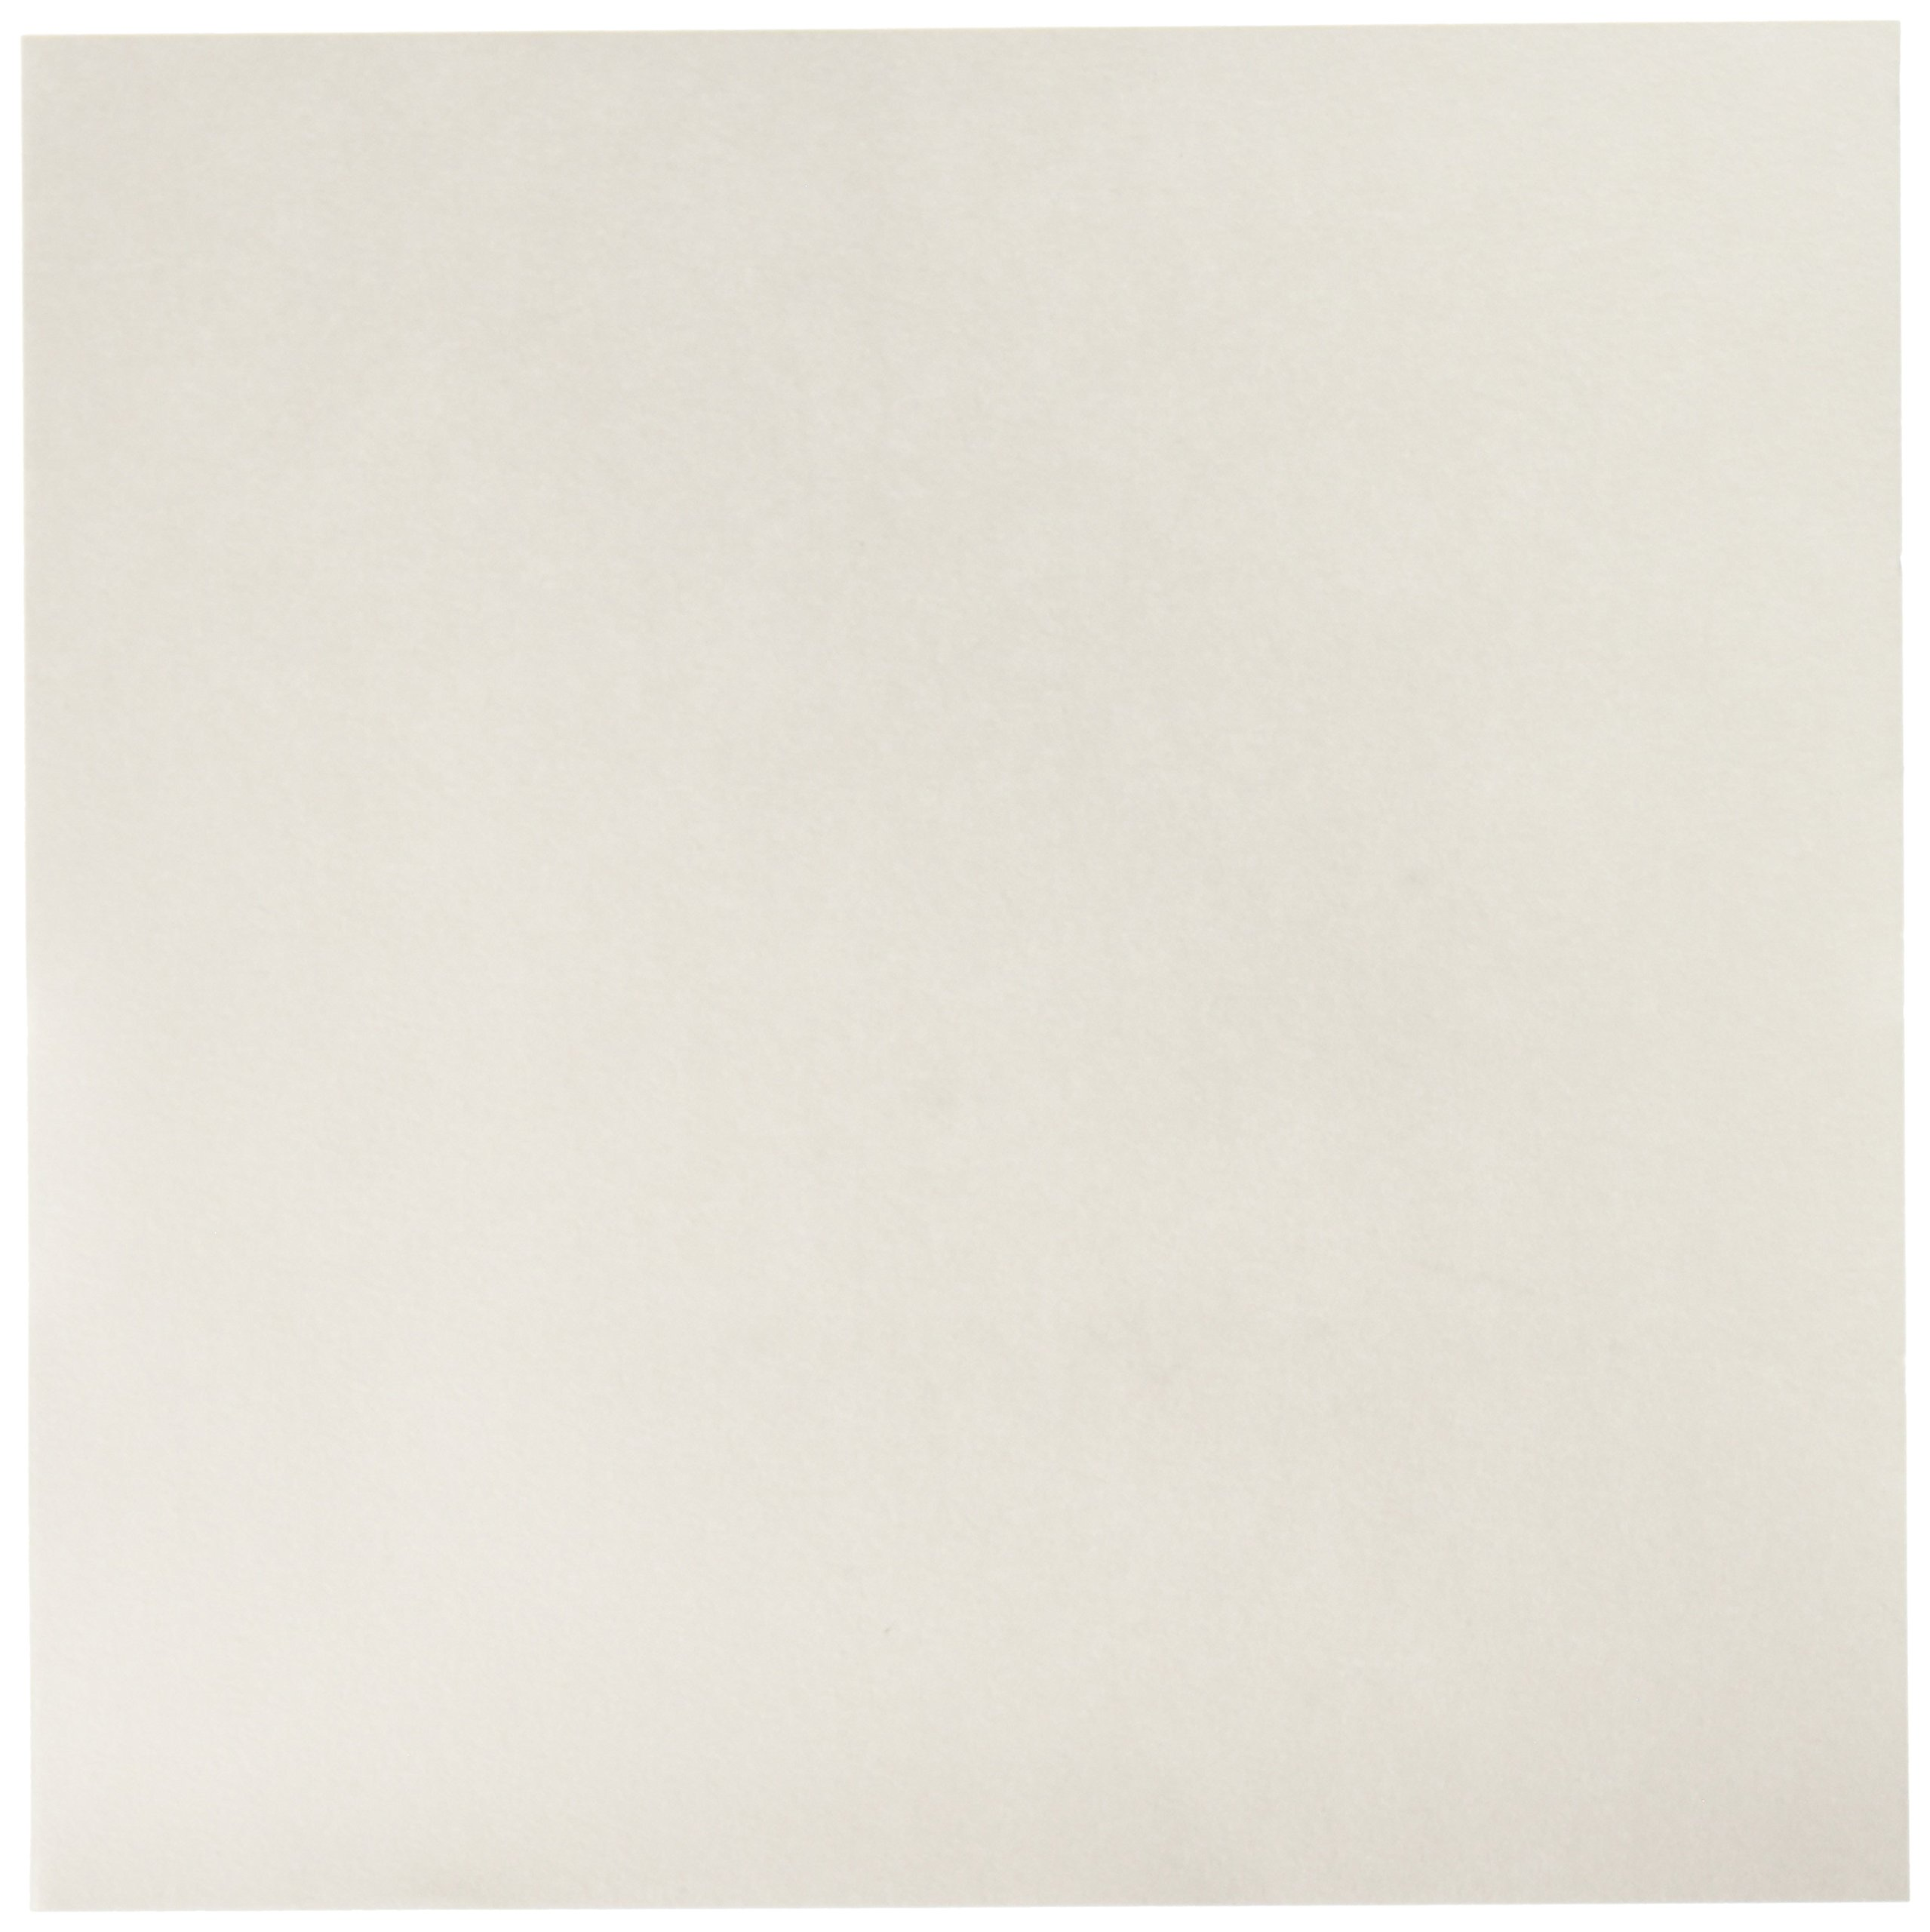 GE Whatman 3001-861 Cellulose Chromatography Paper Sheet, 20cm Length x 20cm Width, 14psi Dry Burst, 130mm/30min Flow Rate, Grade 1 (Pack of 100)